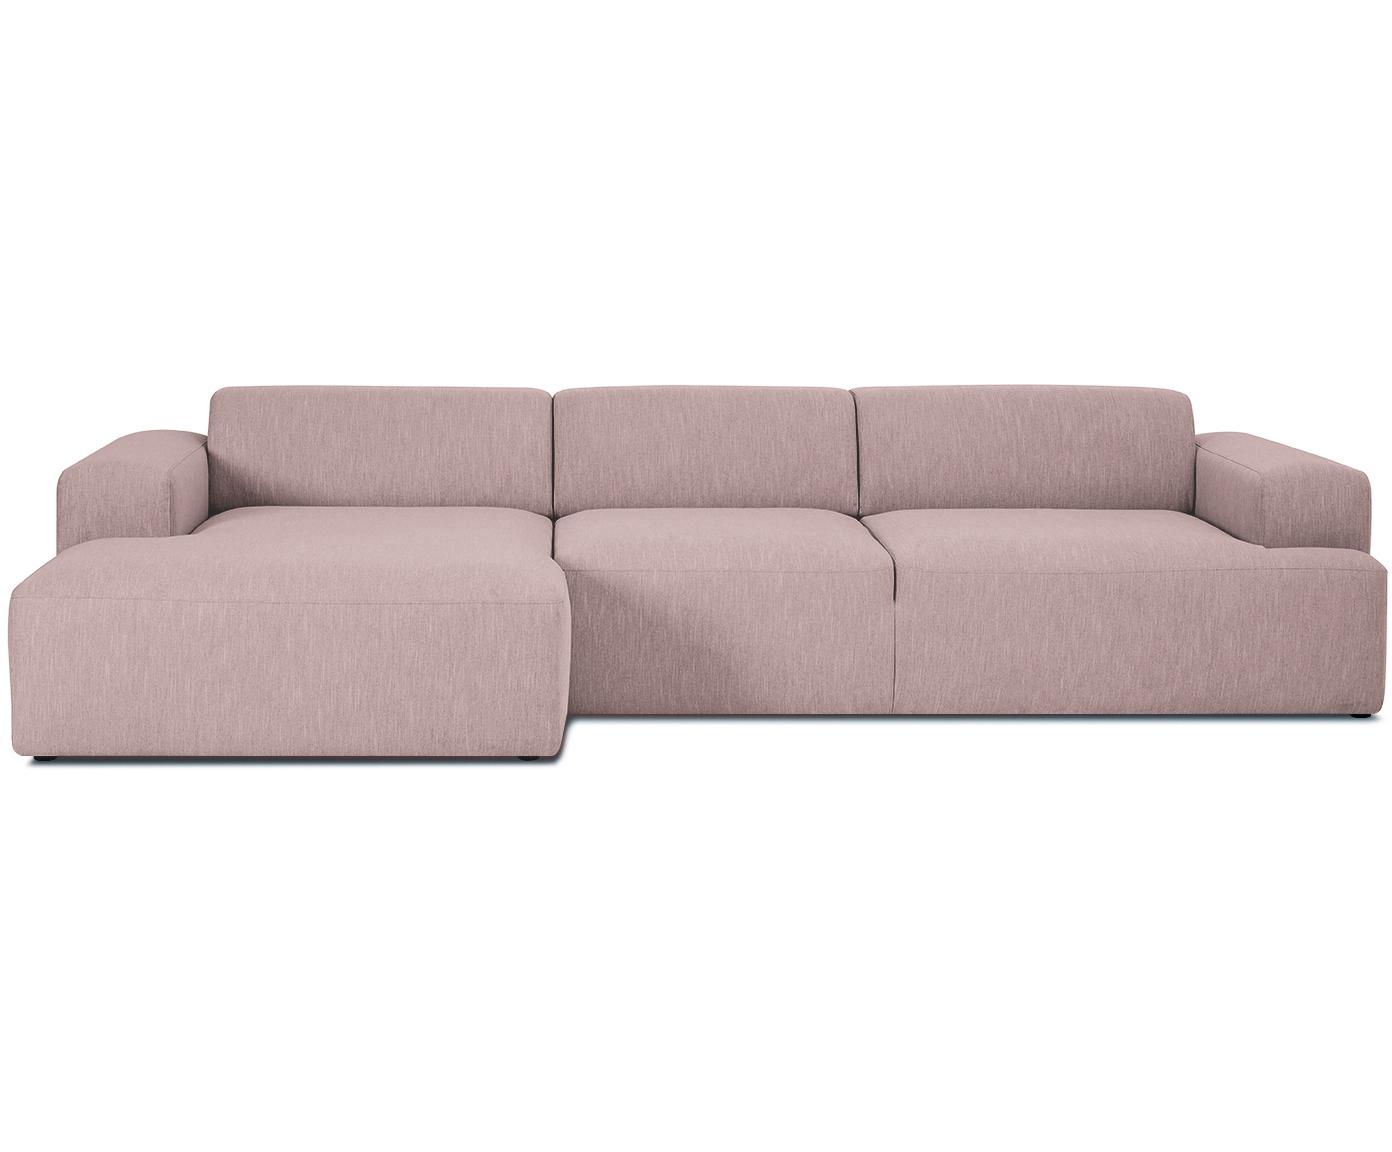 Ecksofa Melva (4-Sitzer), Bezug: Polyester 35.000 Scheuert, Gestell: Massives Kiefernholz, Spa, Füße: Kiefernholz, Webstoff Rosa, B 319 x T 144 cm